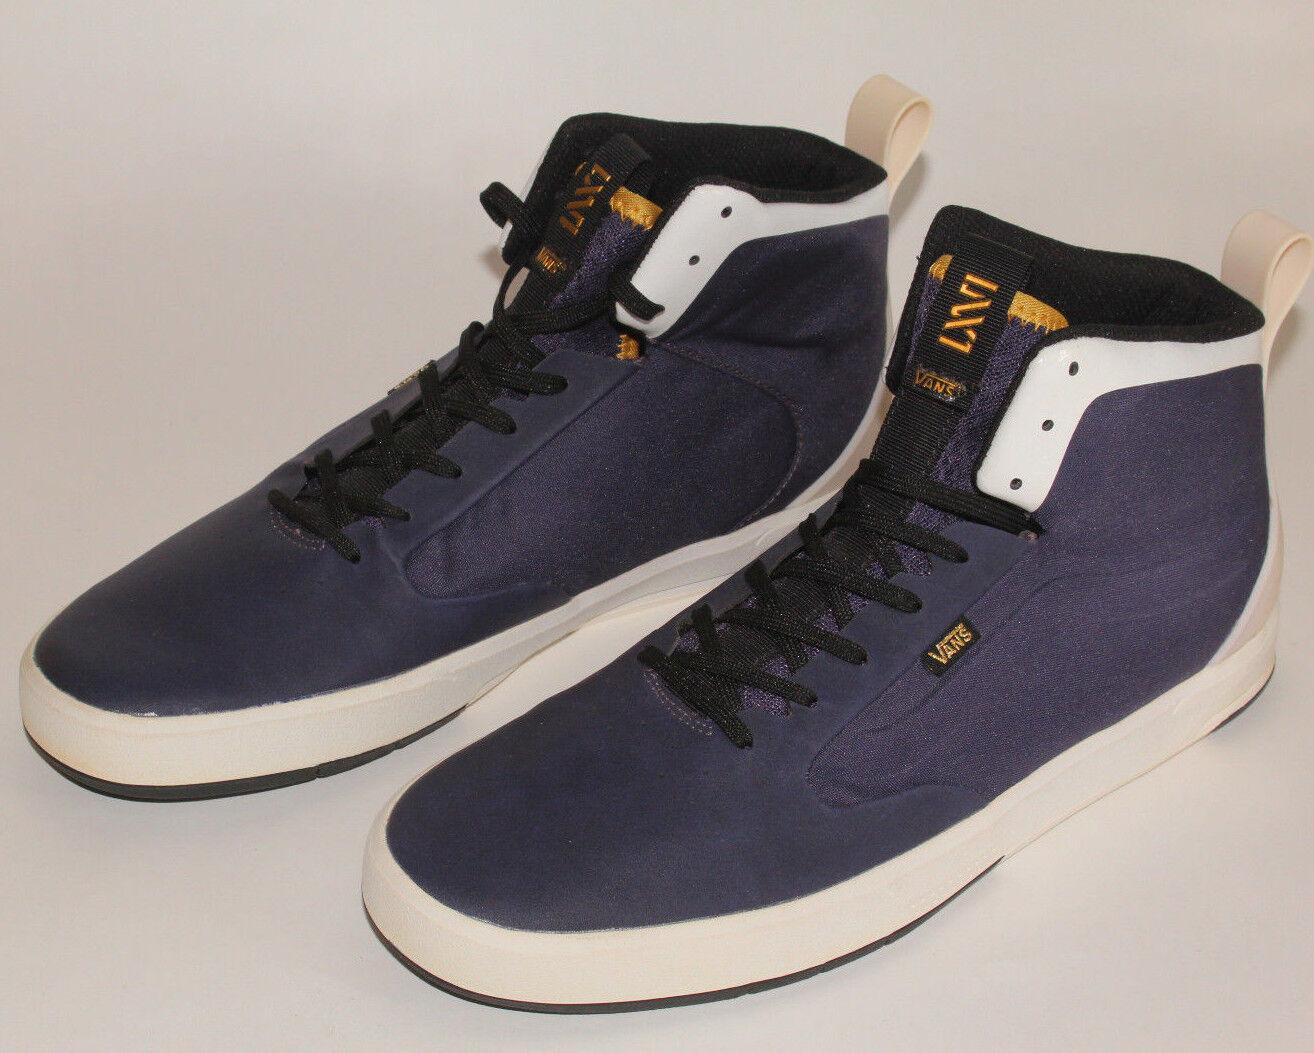 New Vans LXVI Segment Men's Shoes 0VG9CA4 Dark Blue-White-Gold Men`s US Size 9